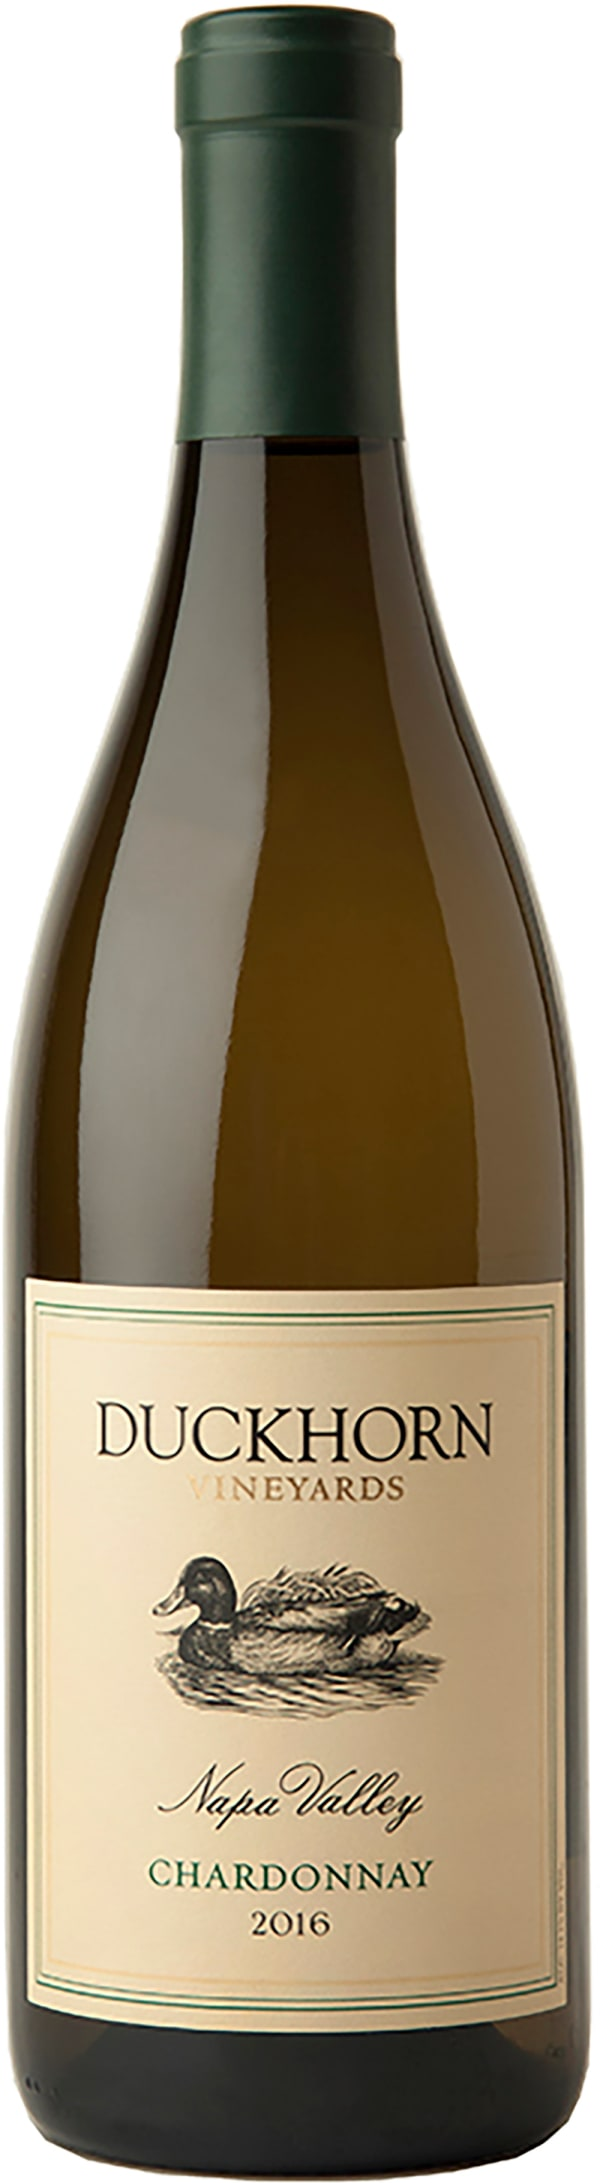 Duckhorn Napa Valley Chardonnay 2016